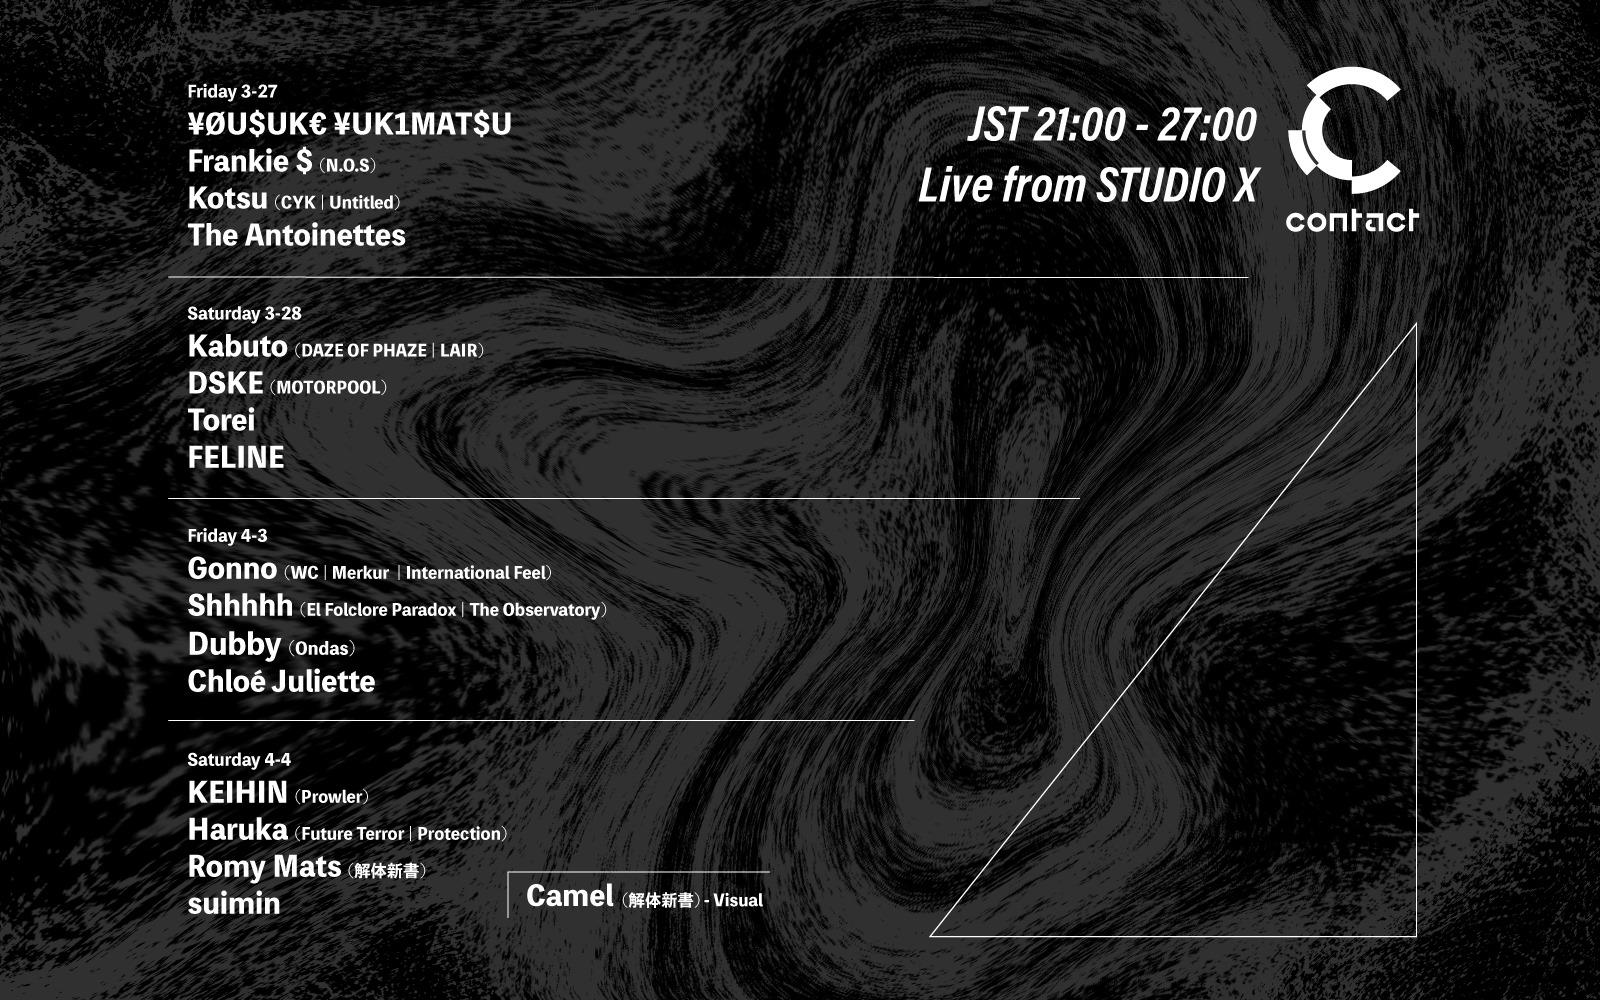 Live from Studio X